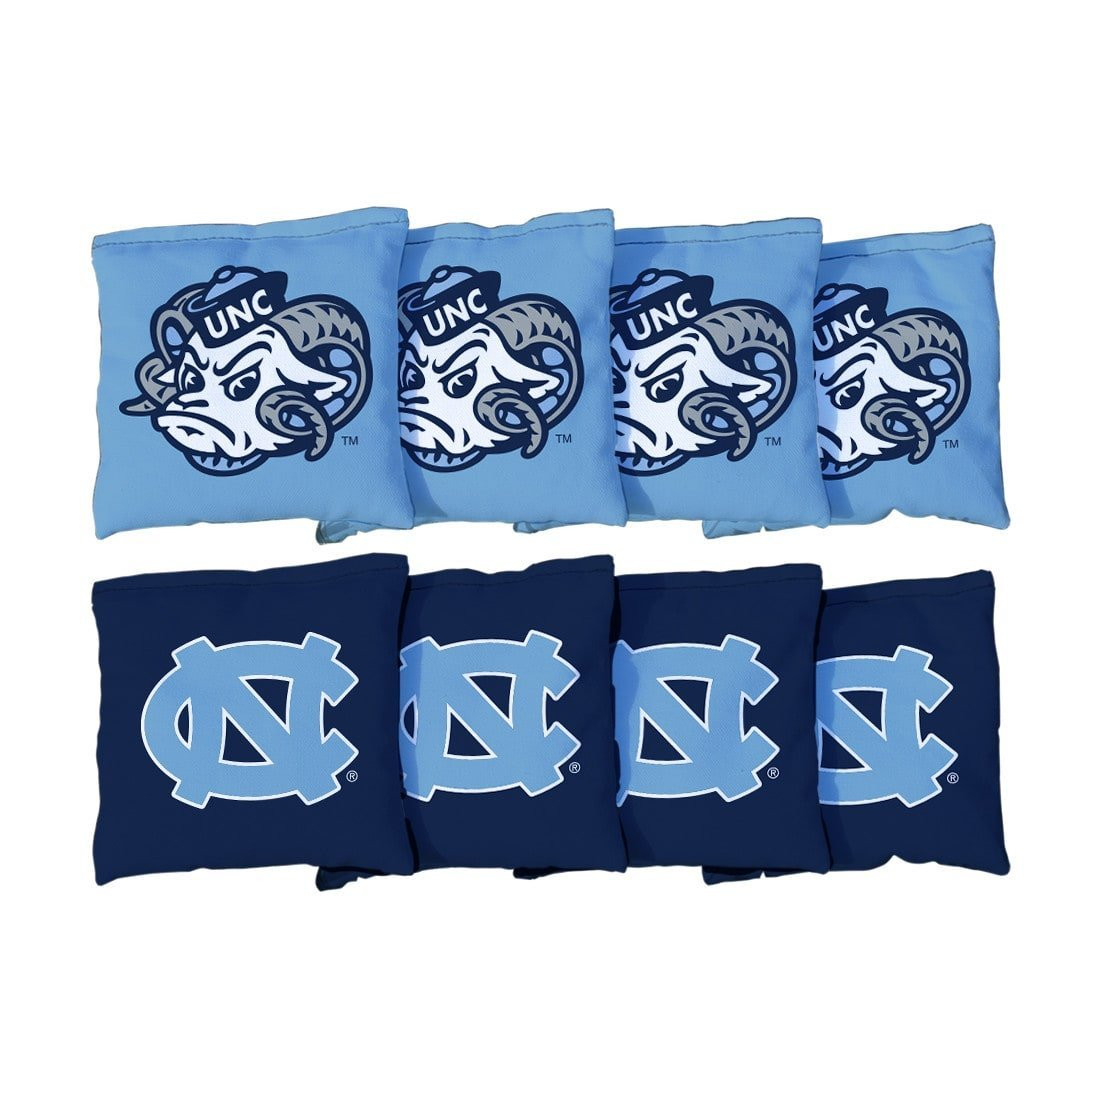 Victory Tailgate 8 North Carolina UNC Tar Heels Regulation All Weather Cornhole Bags